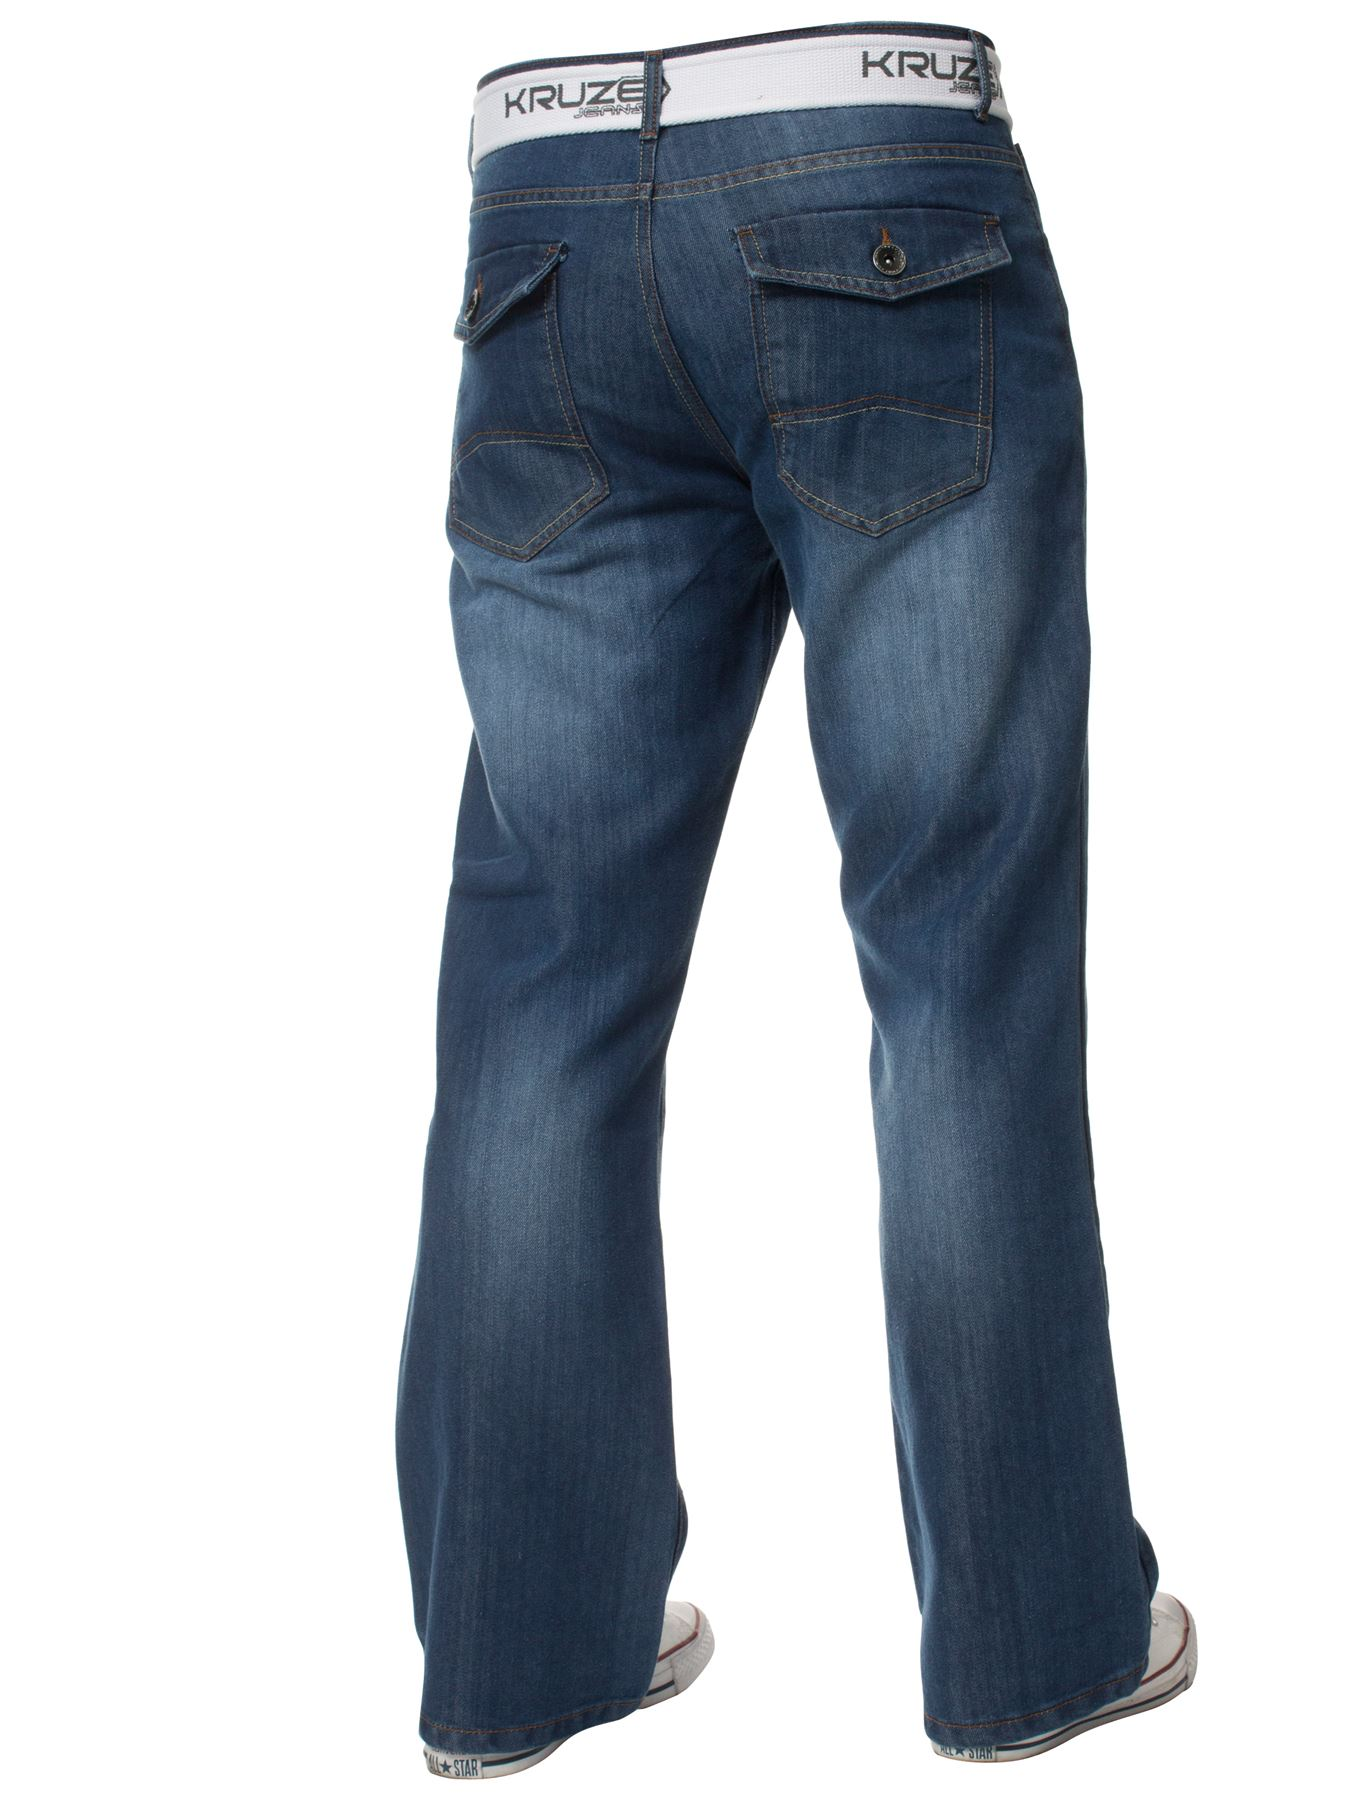 Kruze Uomo Jeans Svasati Gamba Larga Pantaloni Denim Grande lungo Re All Waists